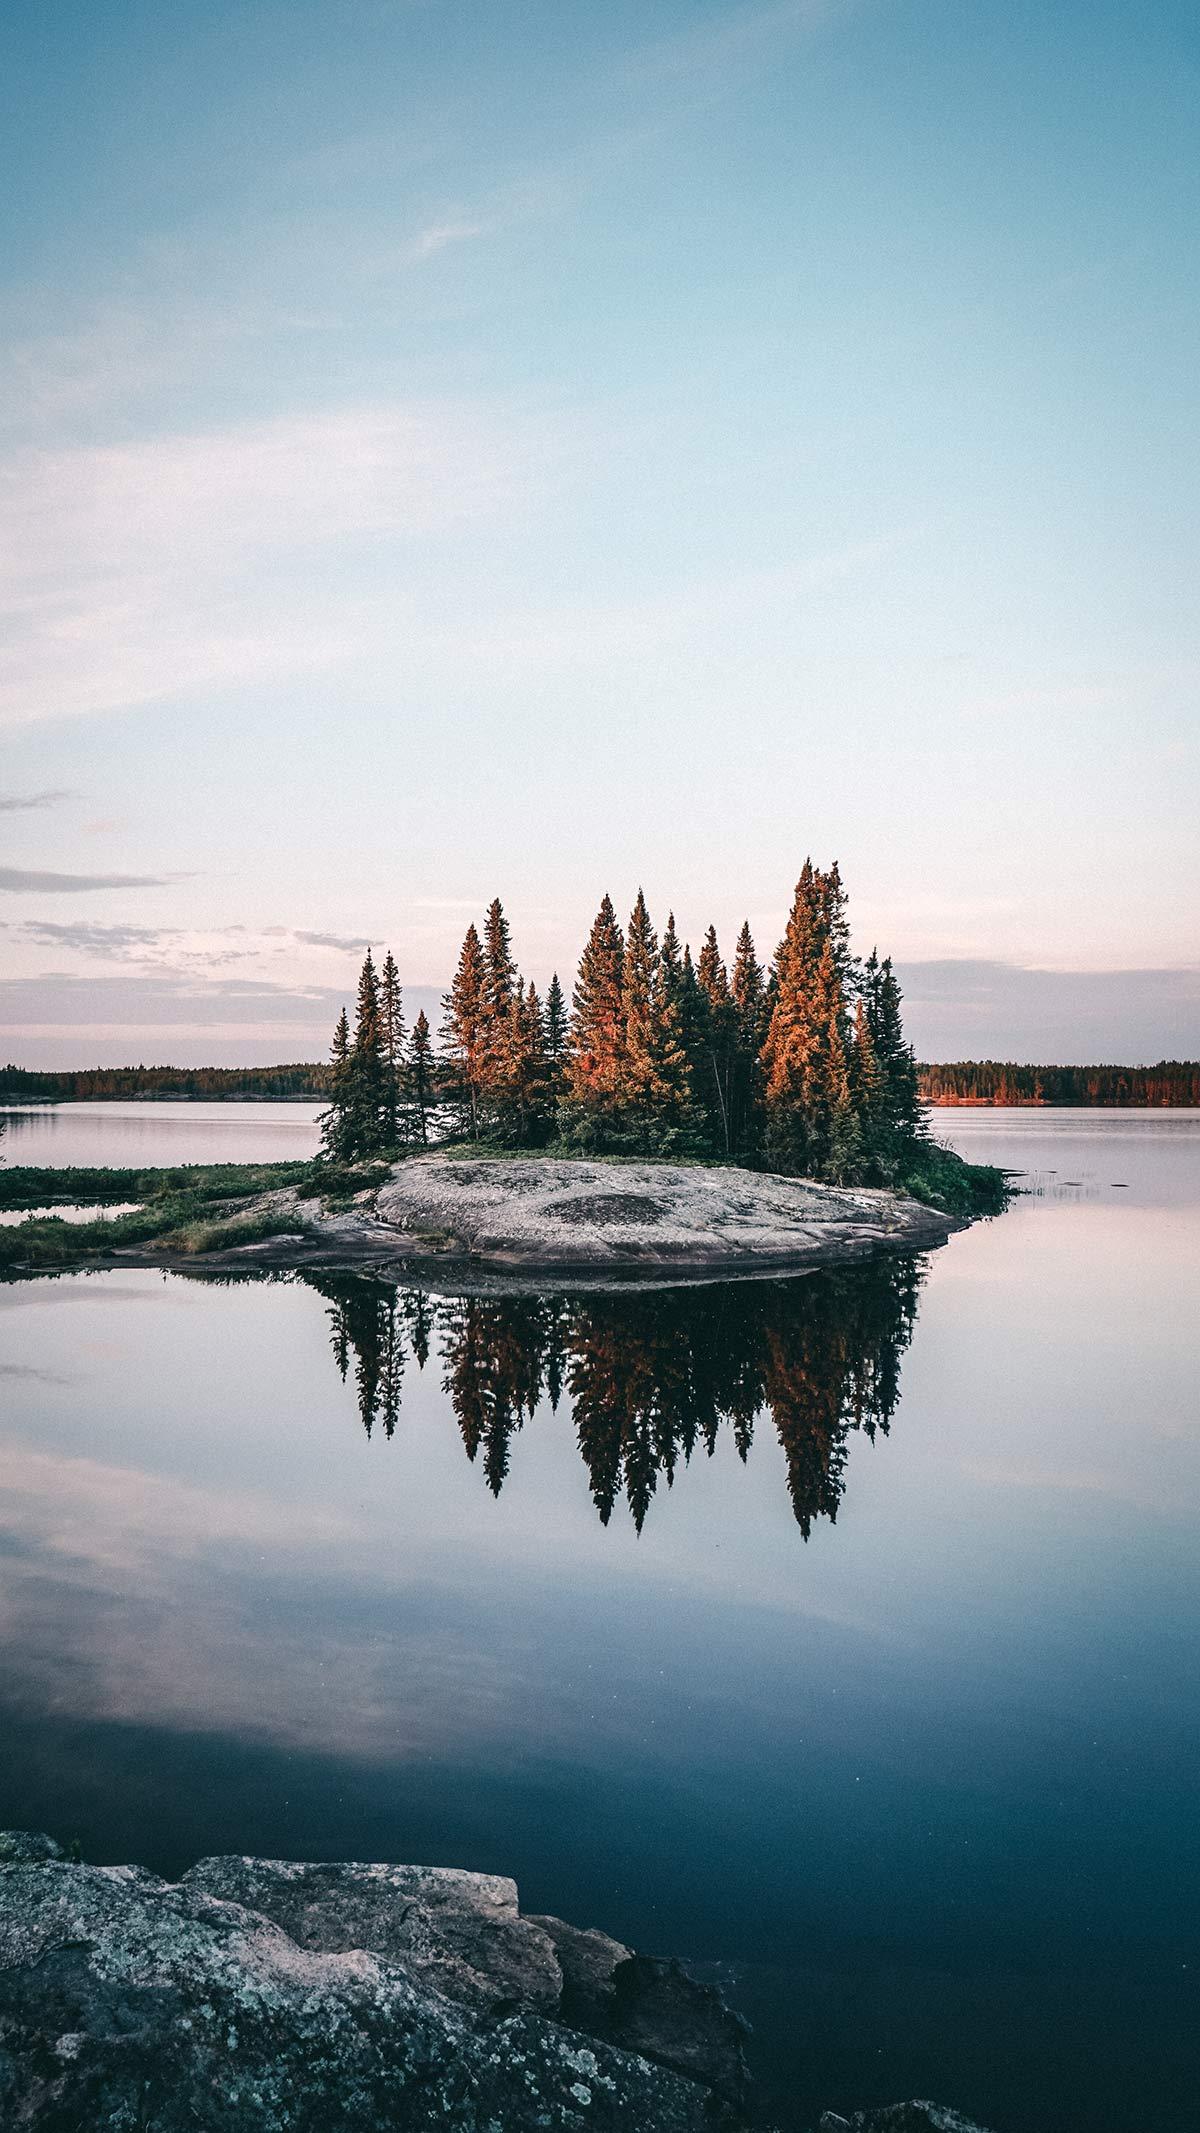 Kanu Trip Seagrim Lake Spiegelung